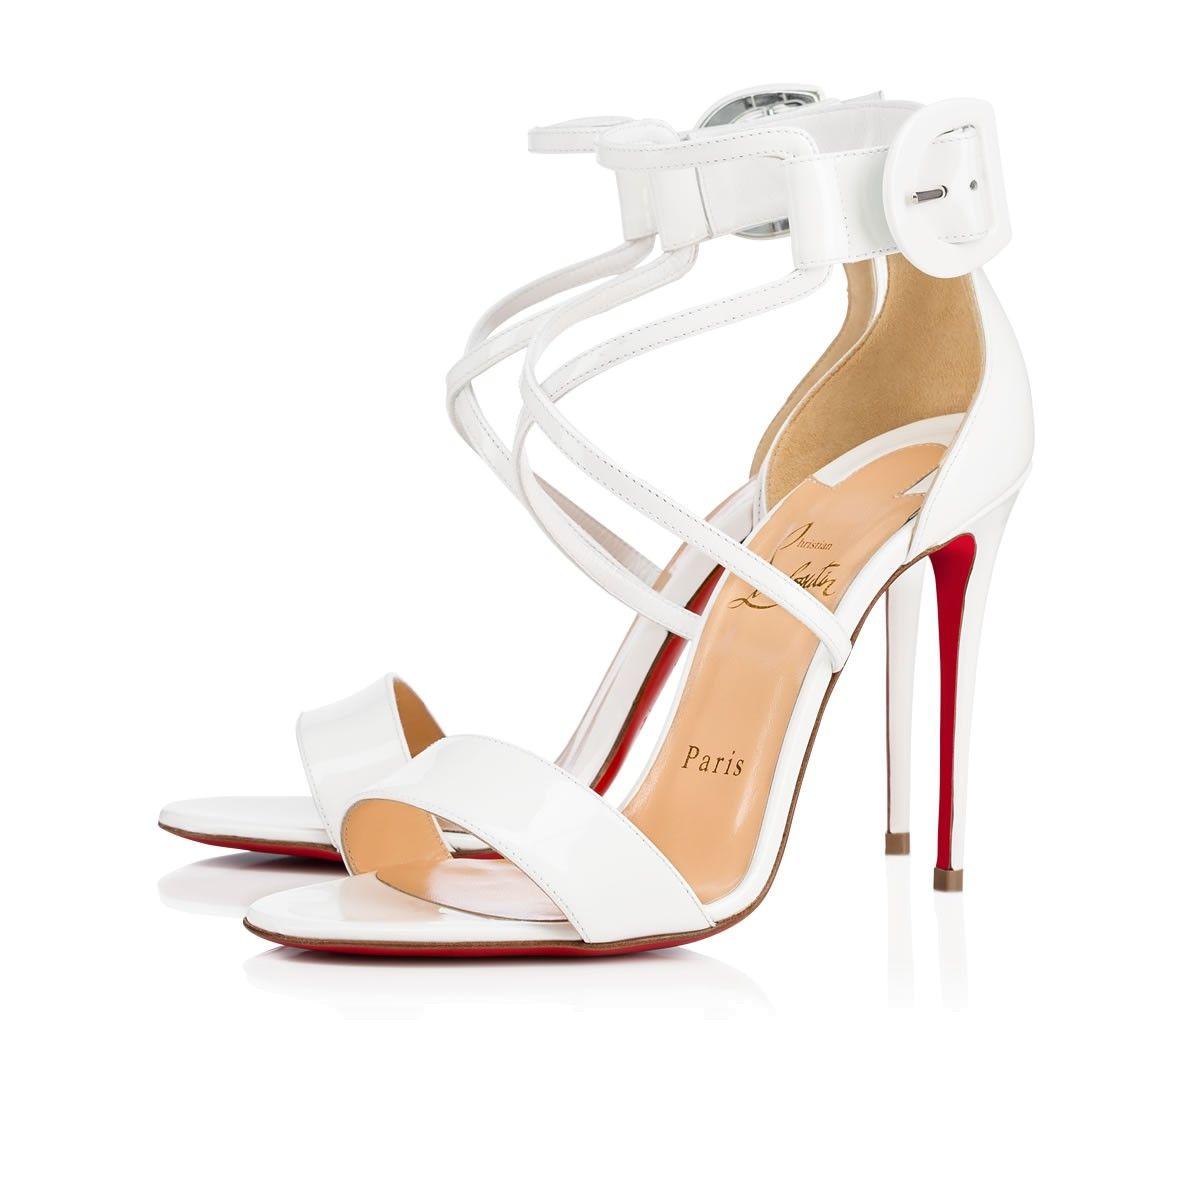 25728df3d7a9 Shoes - Choca - Christian Louboutin